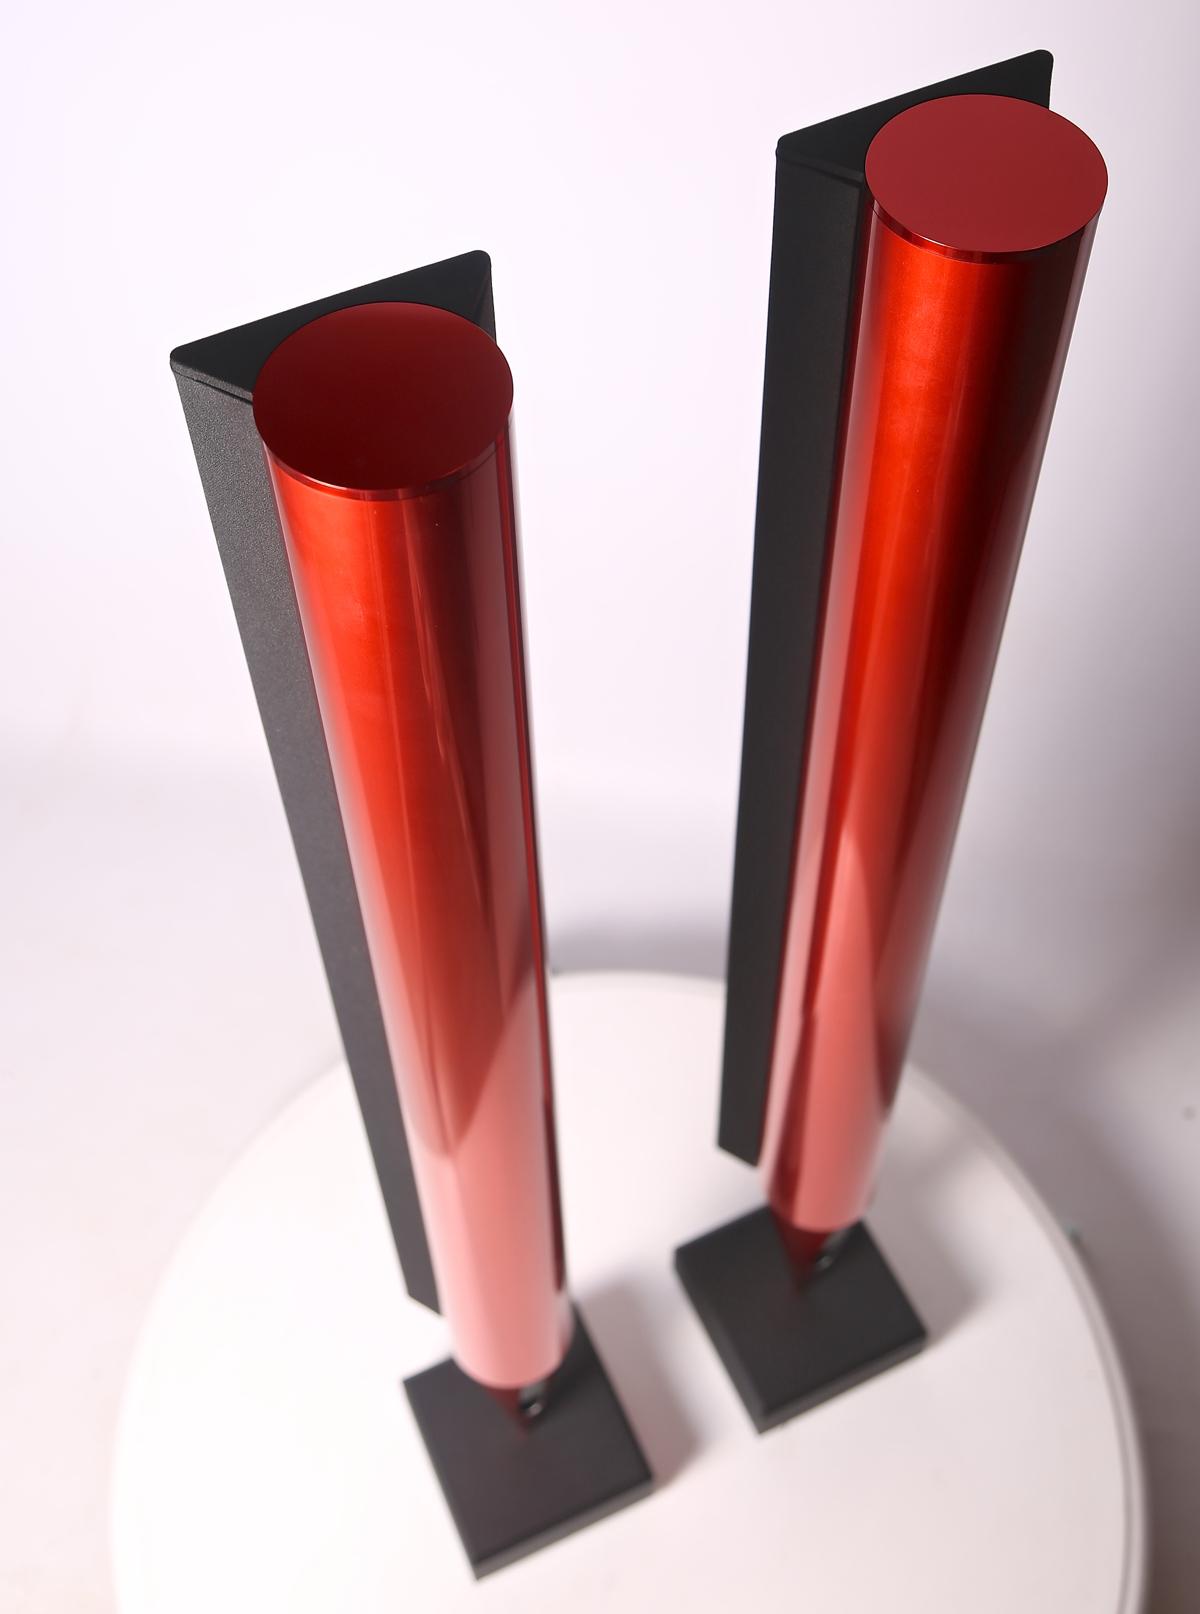 Bang & Olufsen Red Speakers